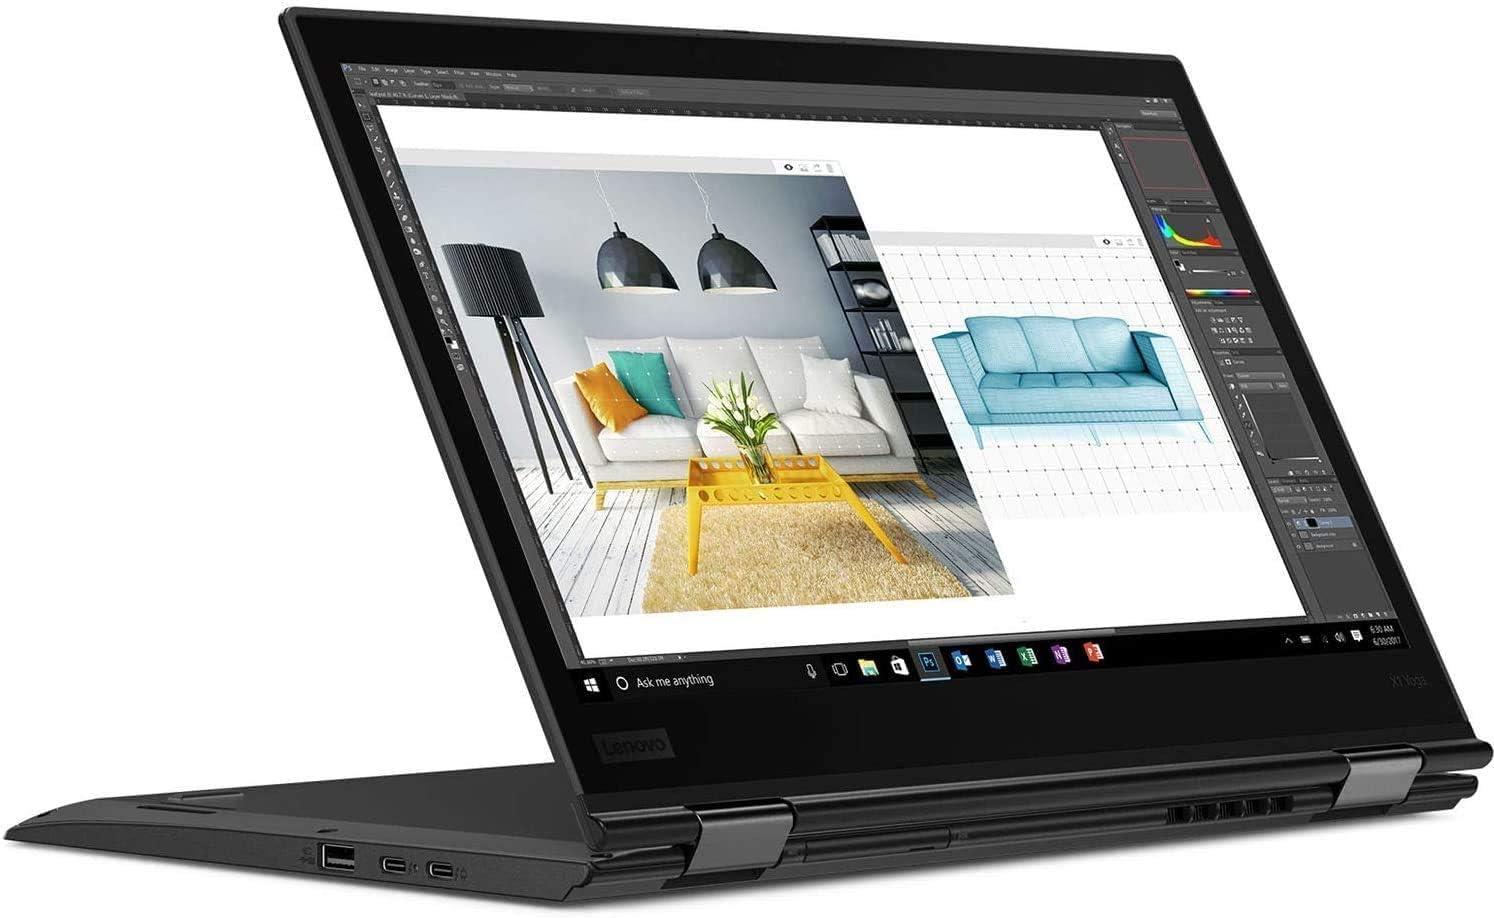 "2020 Lenovo ThinkPad X1 Yoga 3rd Gen 14.0"" WQHD (2560 x 1440) Touchscreen 2-in-1 Business Laptop Computer/ Intel Quad-Core i7 8650U up to 4.2GHz/ 16GB RAM/ 512GB PCIe SSD/ Win10 Pro/ SPMOR Mouse Pad"